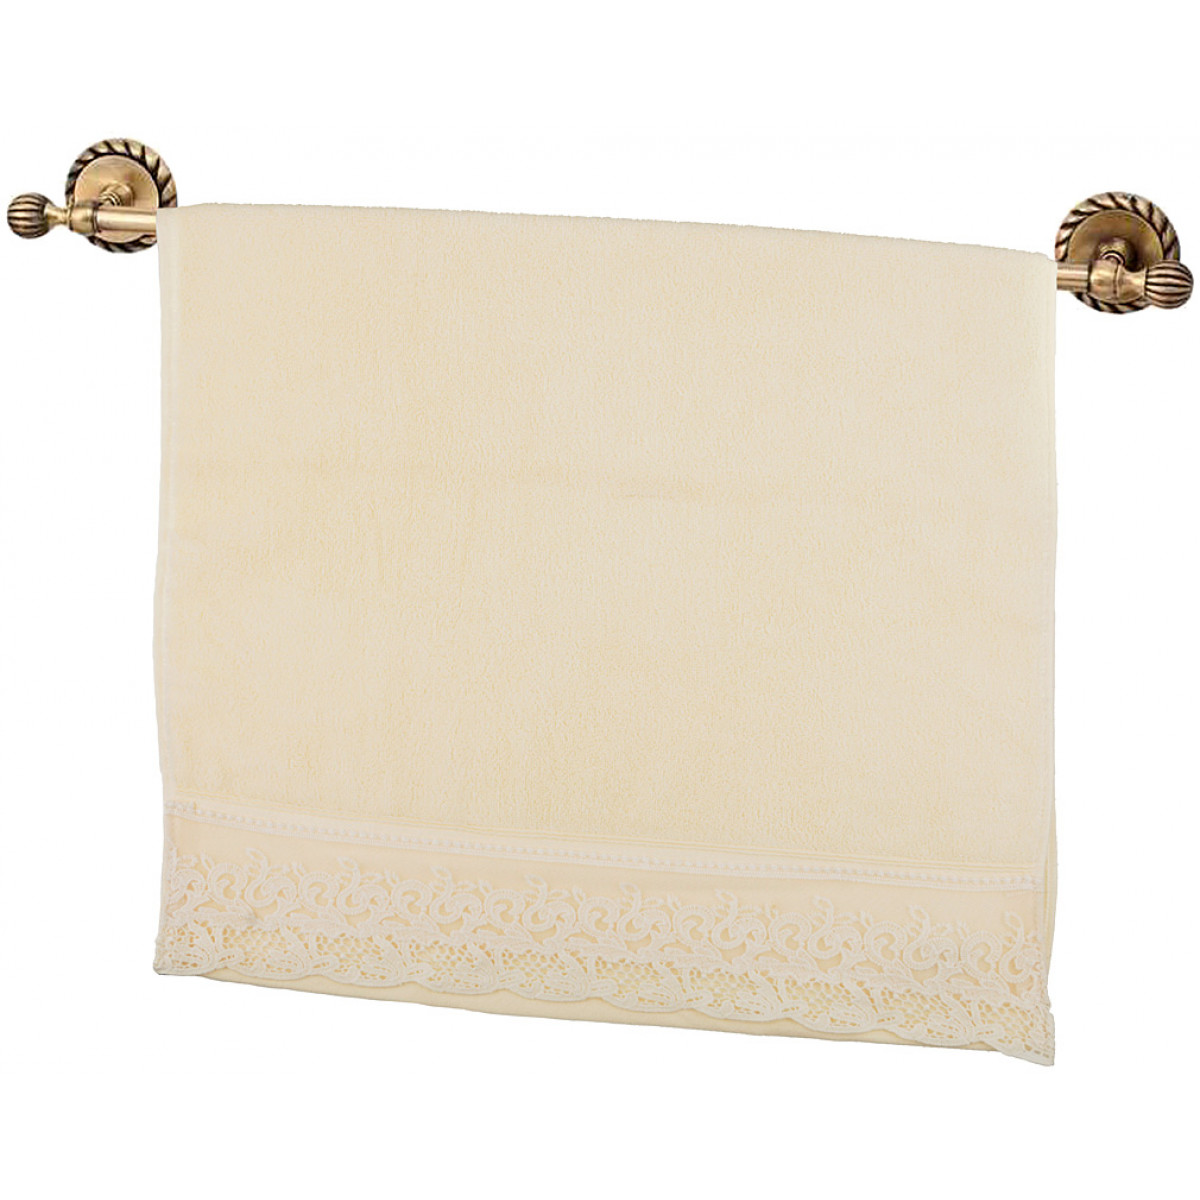 Полотенца Santalino Полотенце Heleen  (50х90 см) полотенца santalino полотенце shulamite 40х70 см